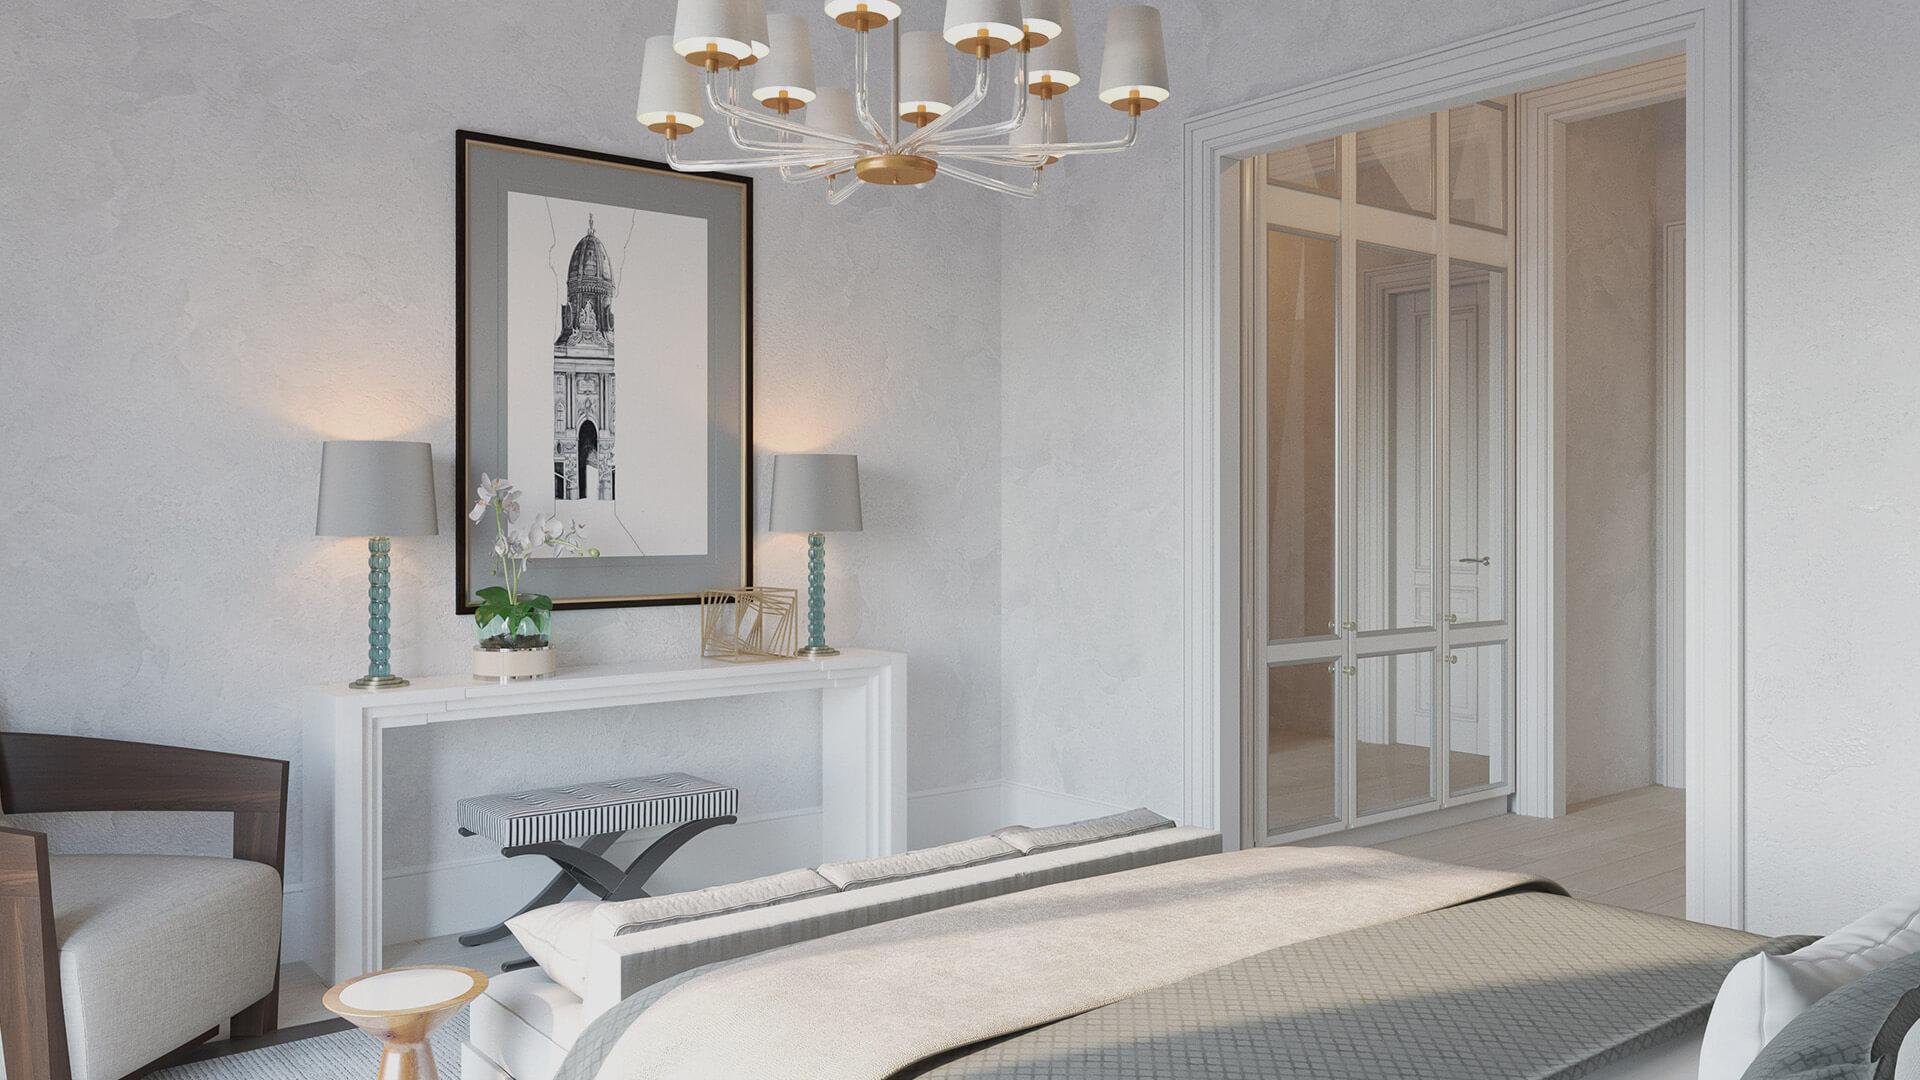 Интерьер спальни, вариант 2, вид 3